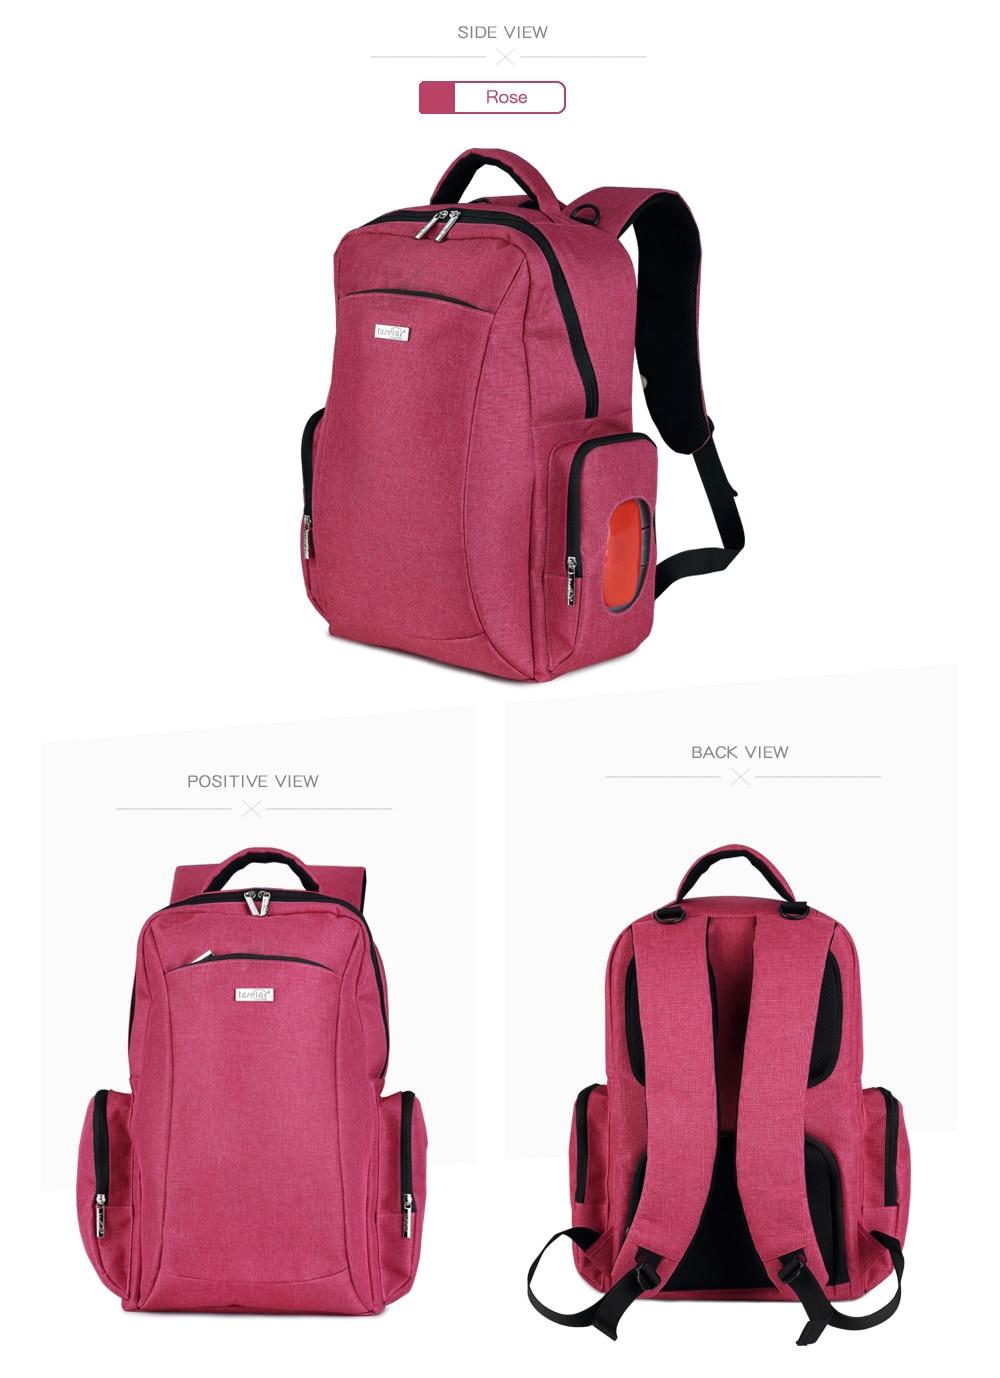 baby diaper backpack10026 (22)